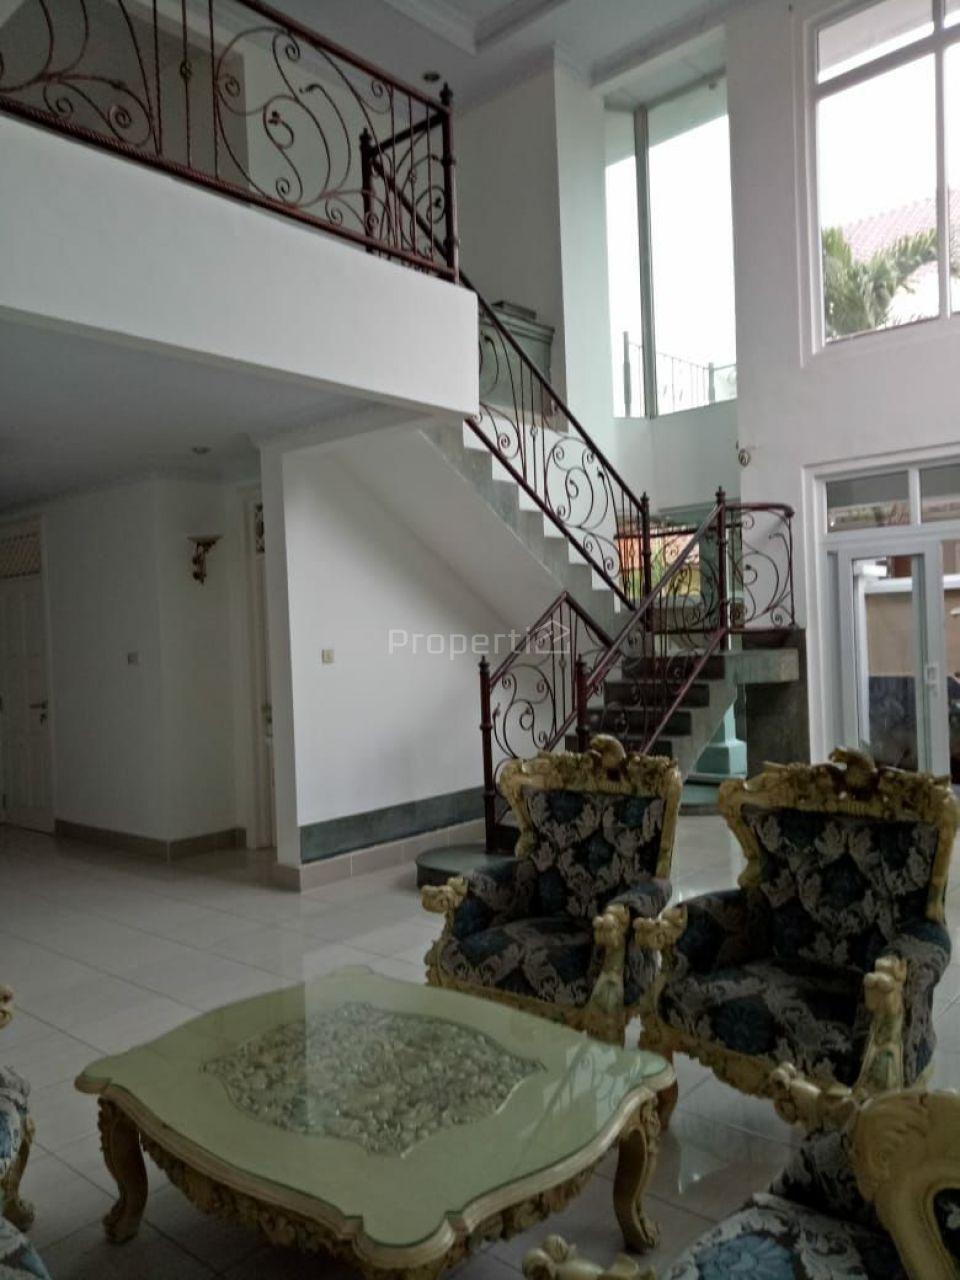 Rumah Baru Posisi Hook di Pulo Gadung, DKI Jakarta